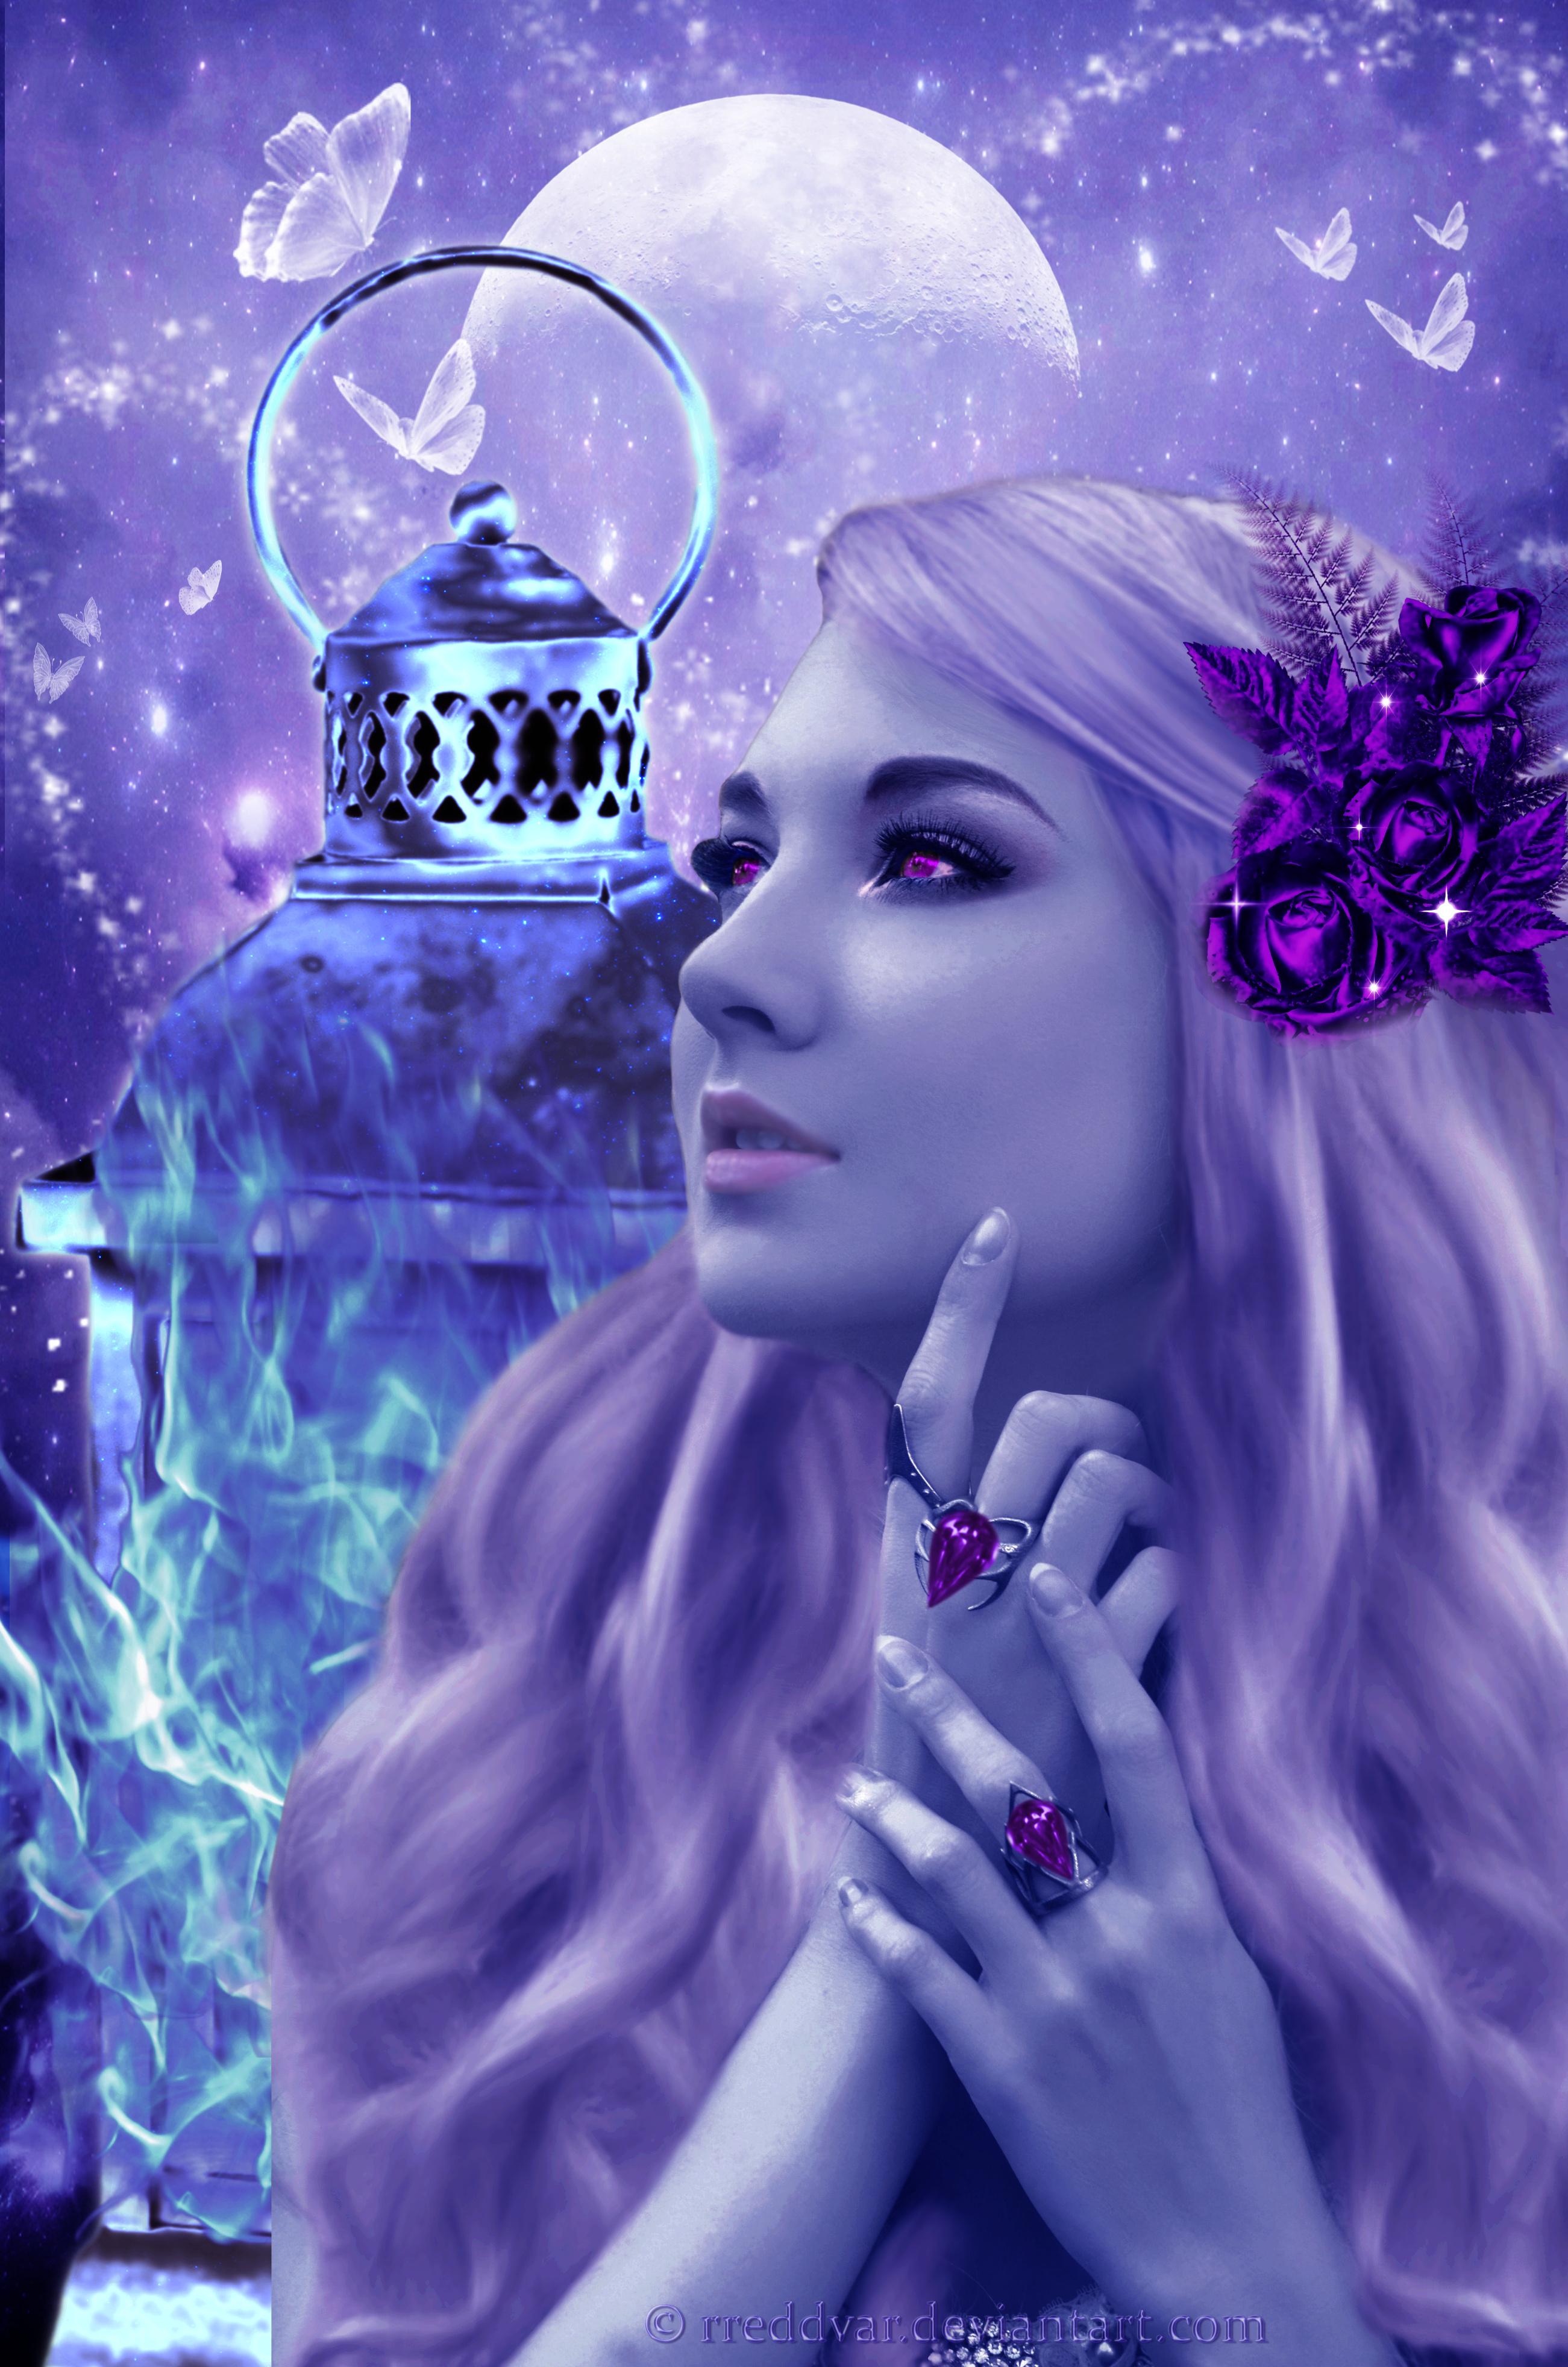 Daughter of Eternity